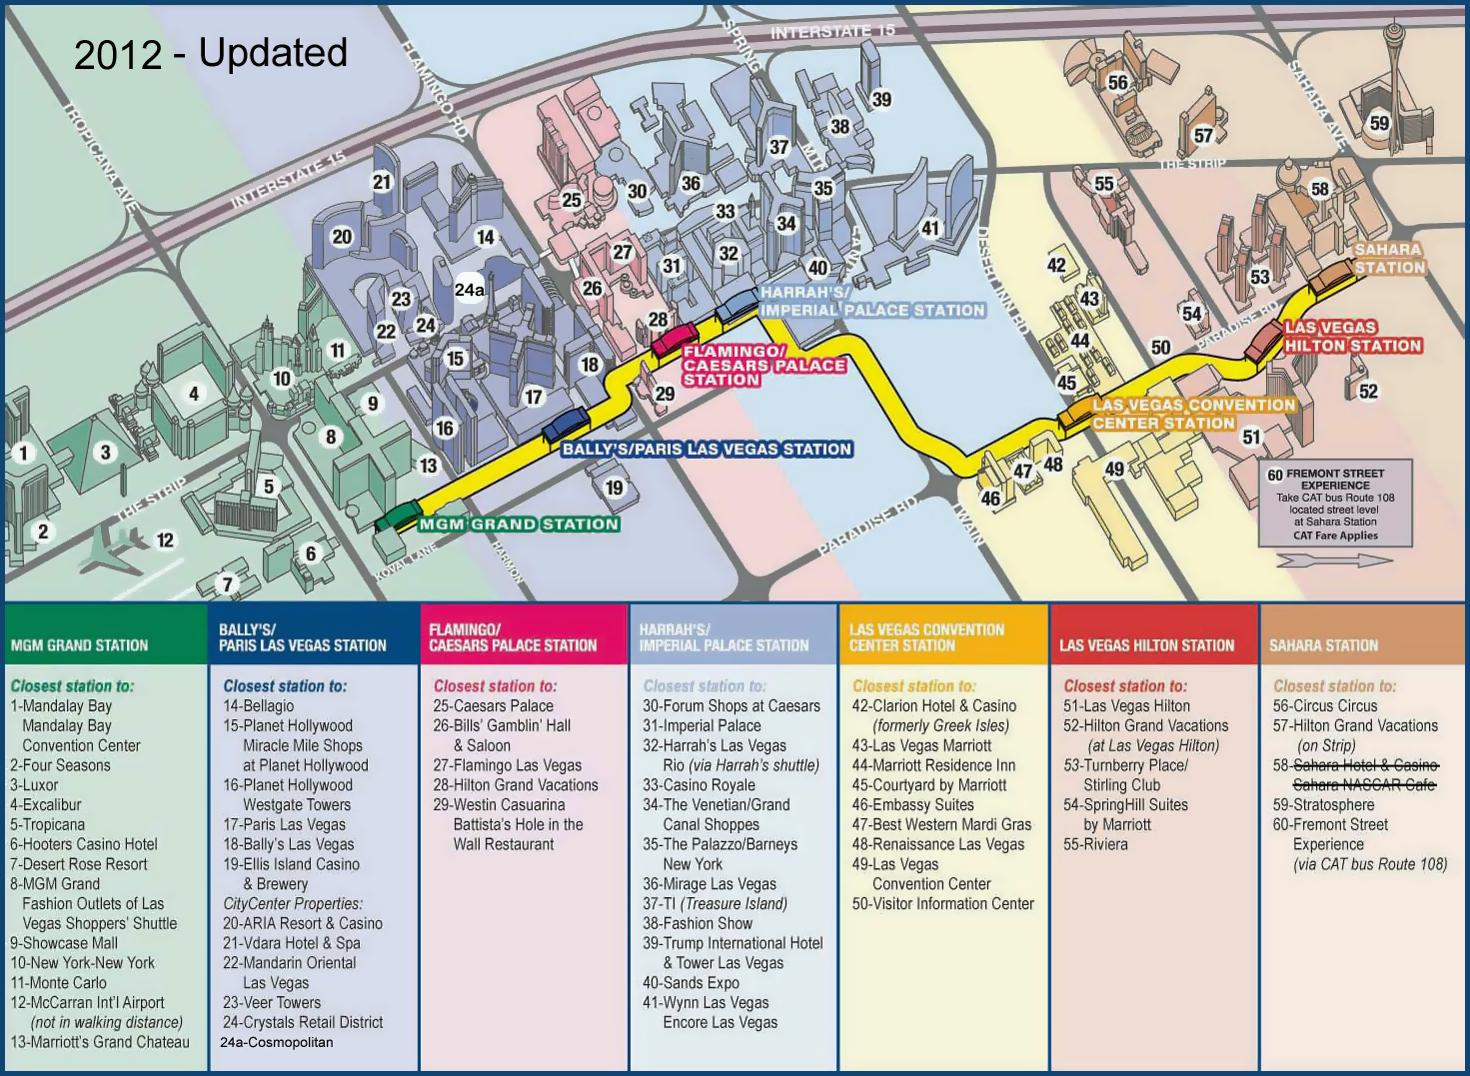 Monorail In Las Vegas Map.Large Las Vegas Strip Map With Monorail 2012 Vidiani Com Maps